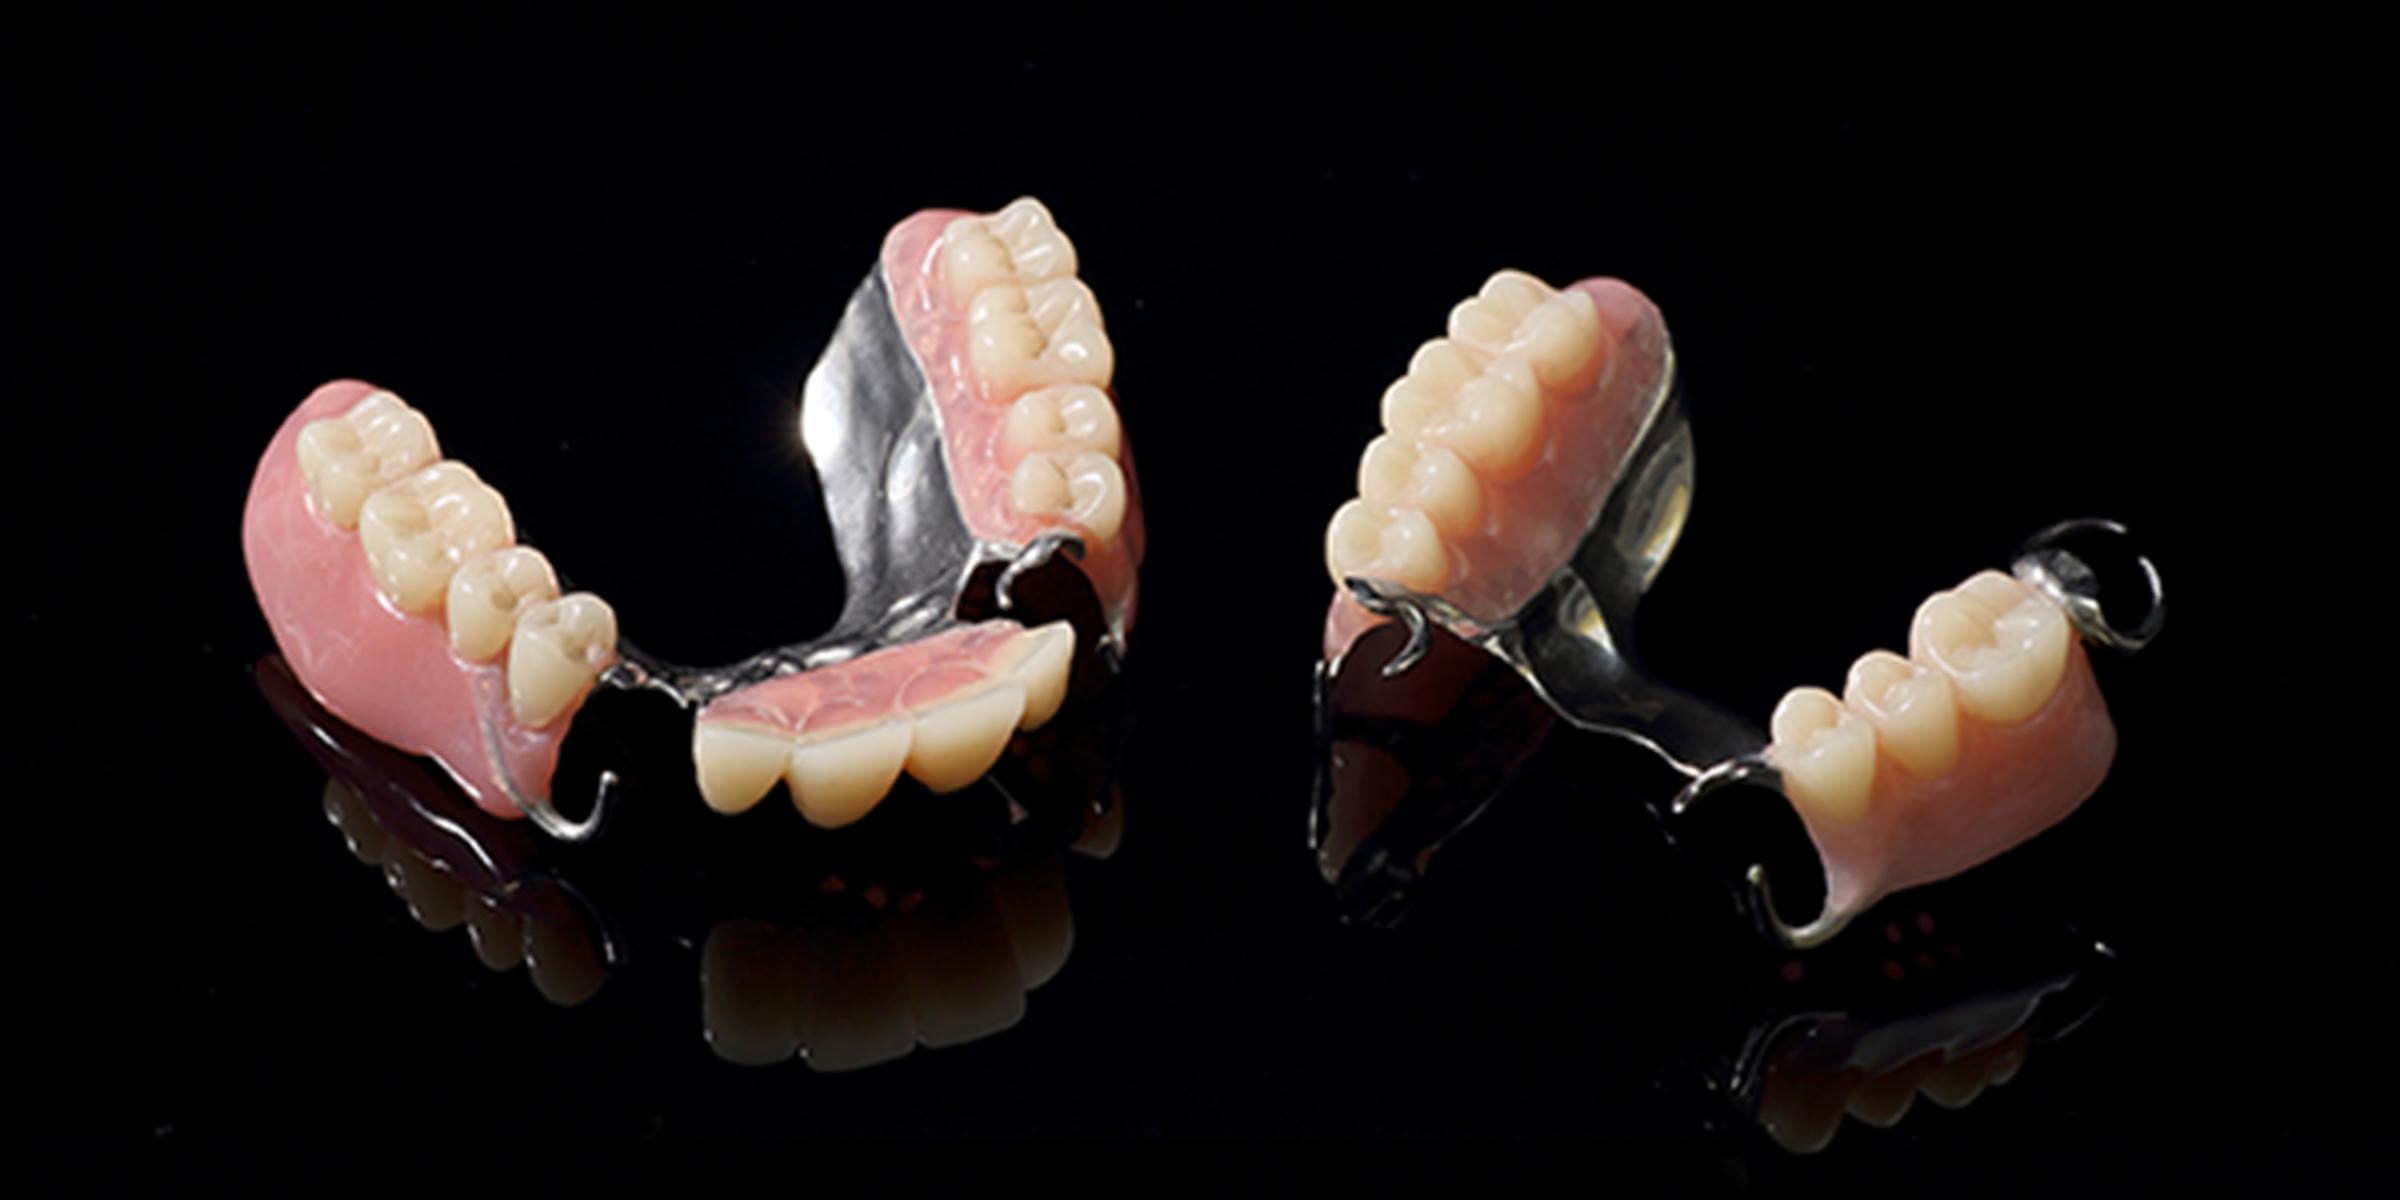 金属床部分入れ歯